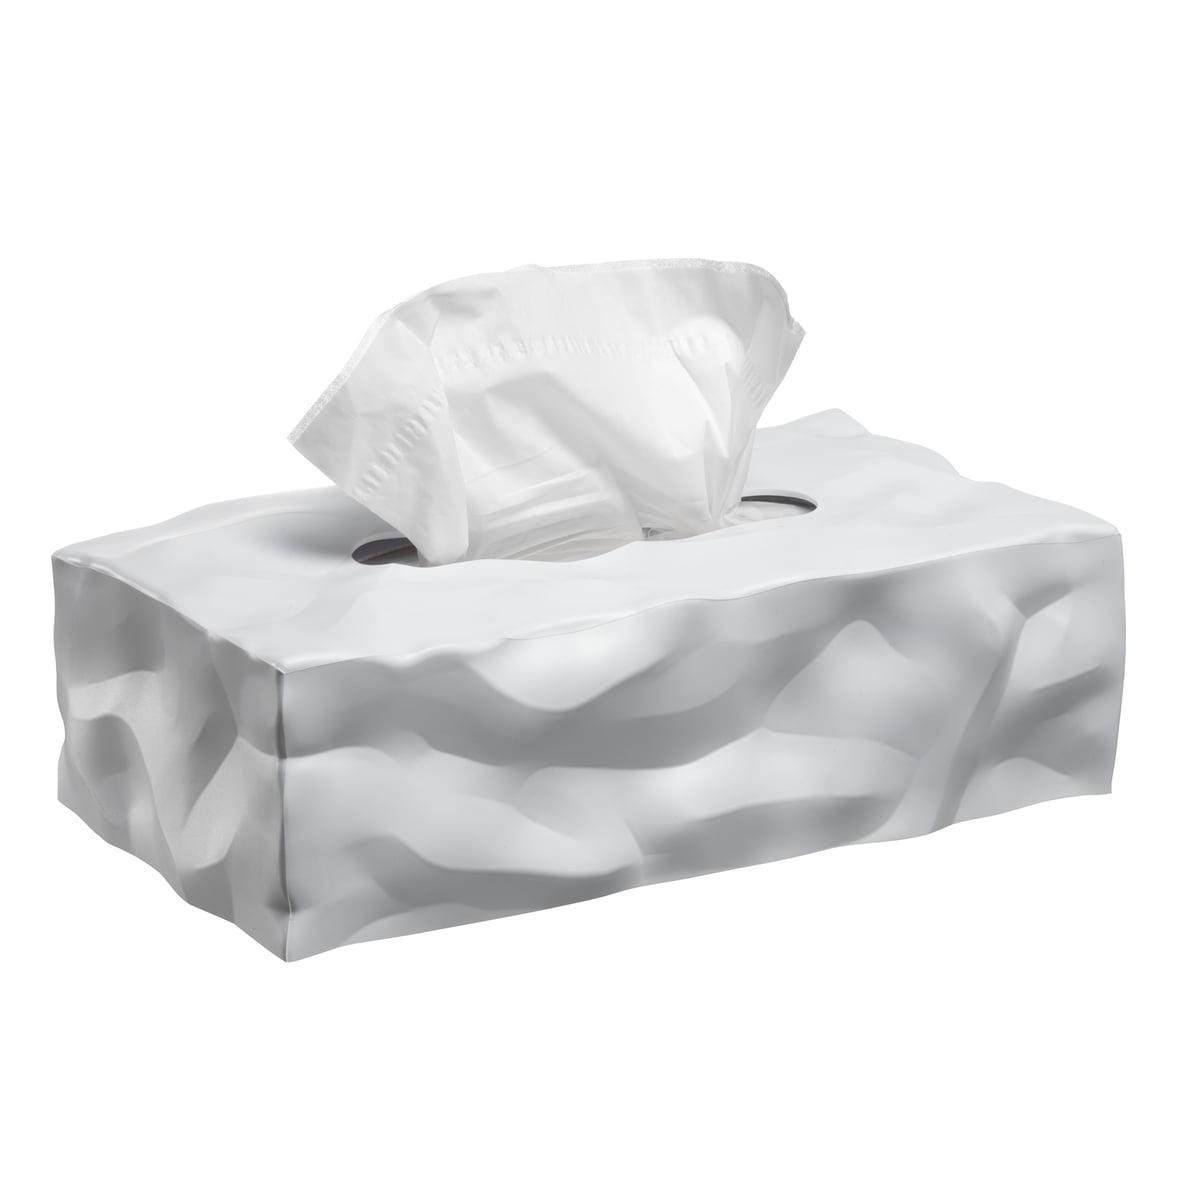 Essey   Wipy 2 Cube Tissue Box